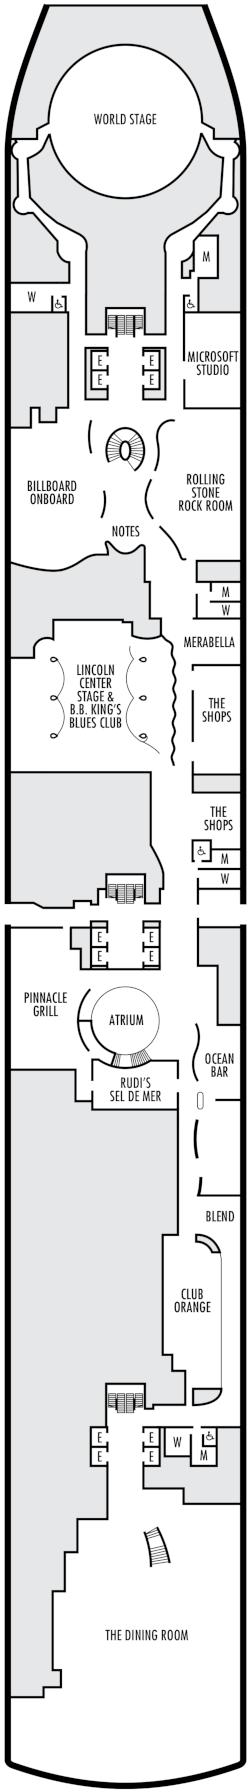 Koningsdam Plaza Deck Deck Plan